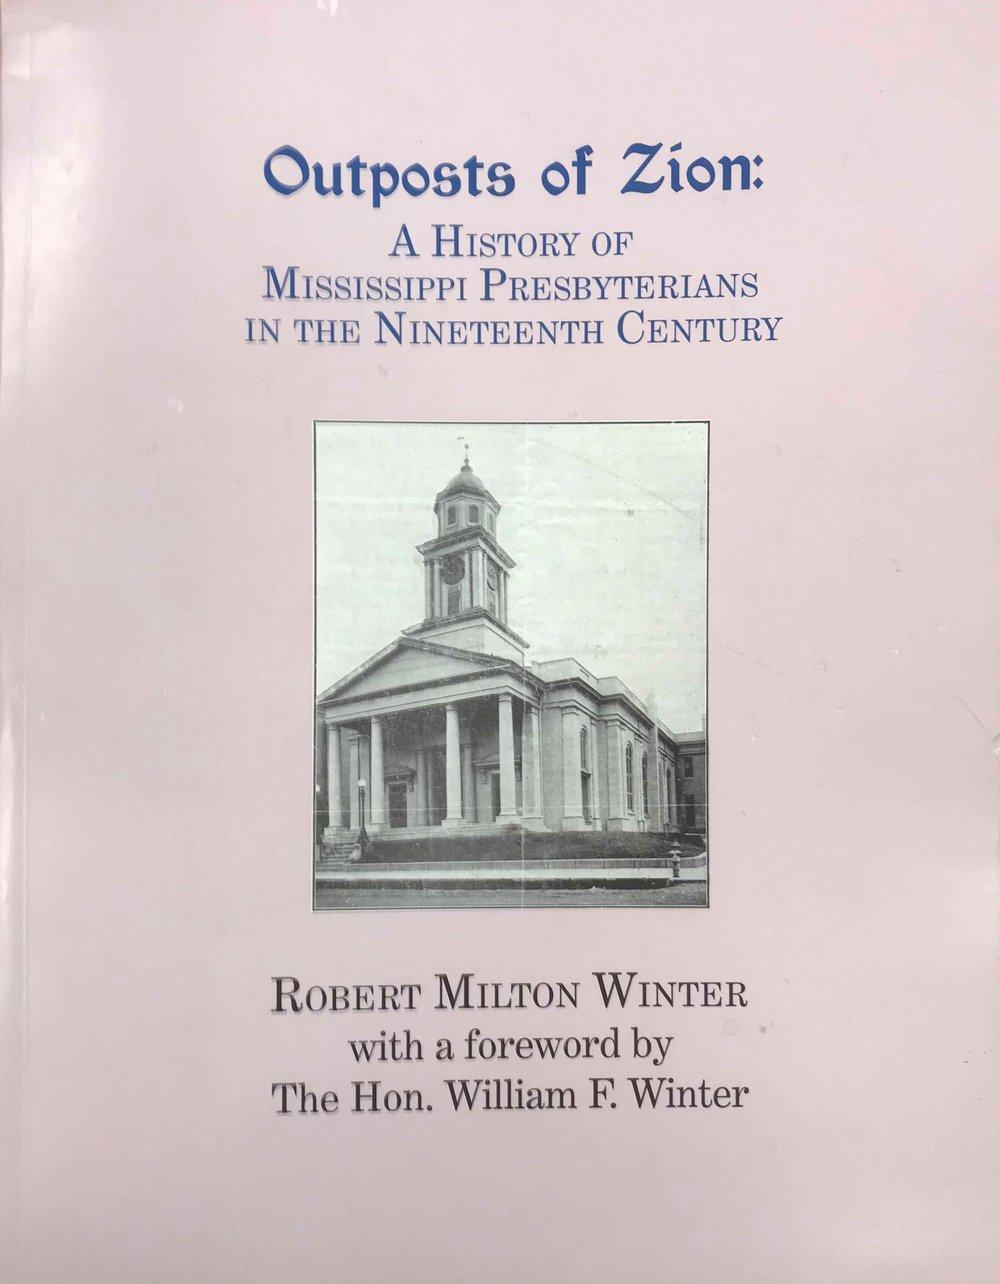 Winter, Outposts of Zion.jpg